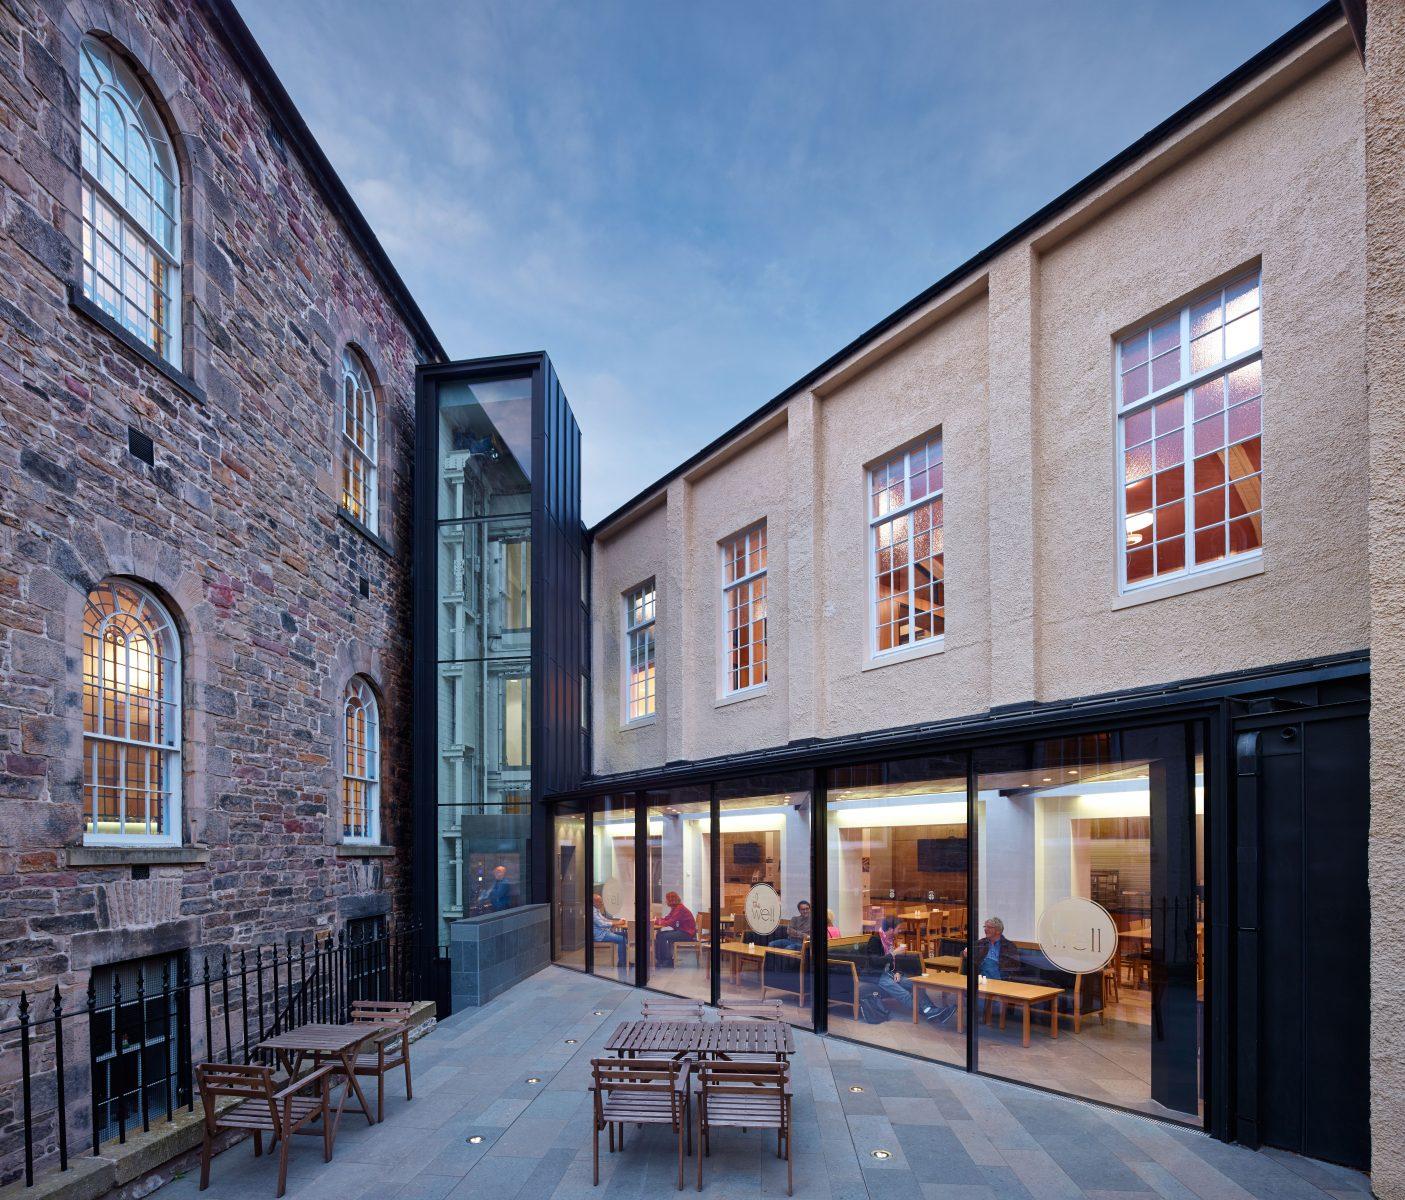 City of Edinburgh Methodist Church